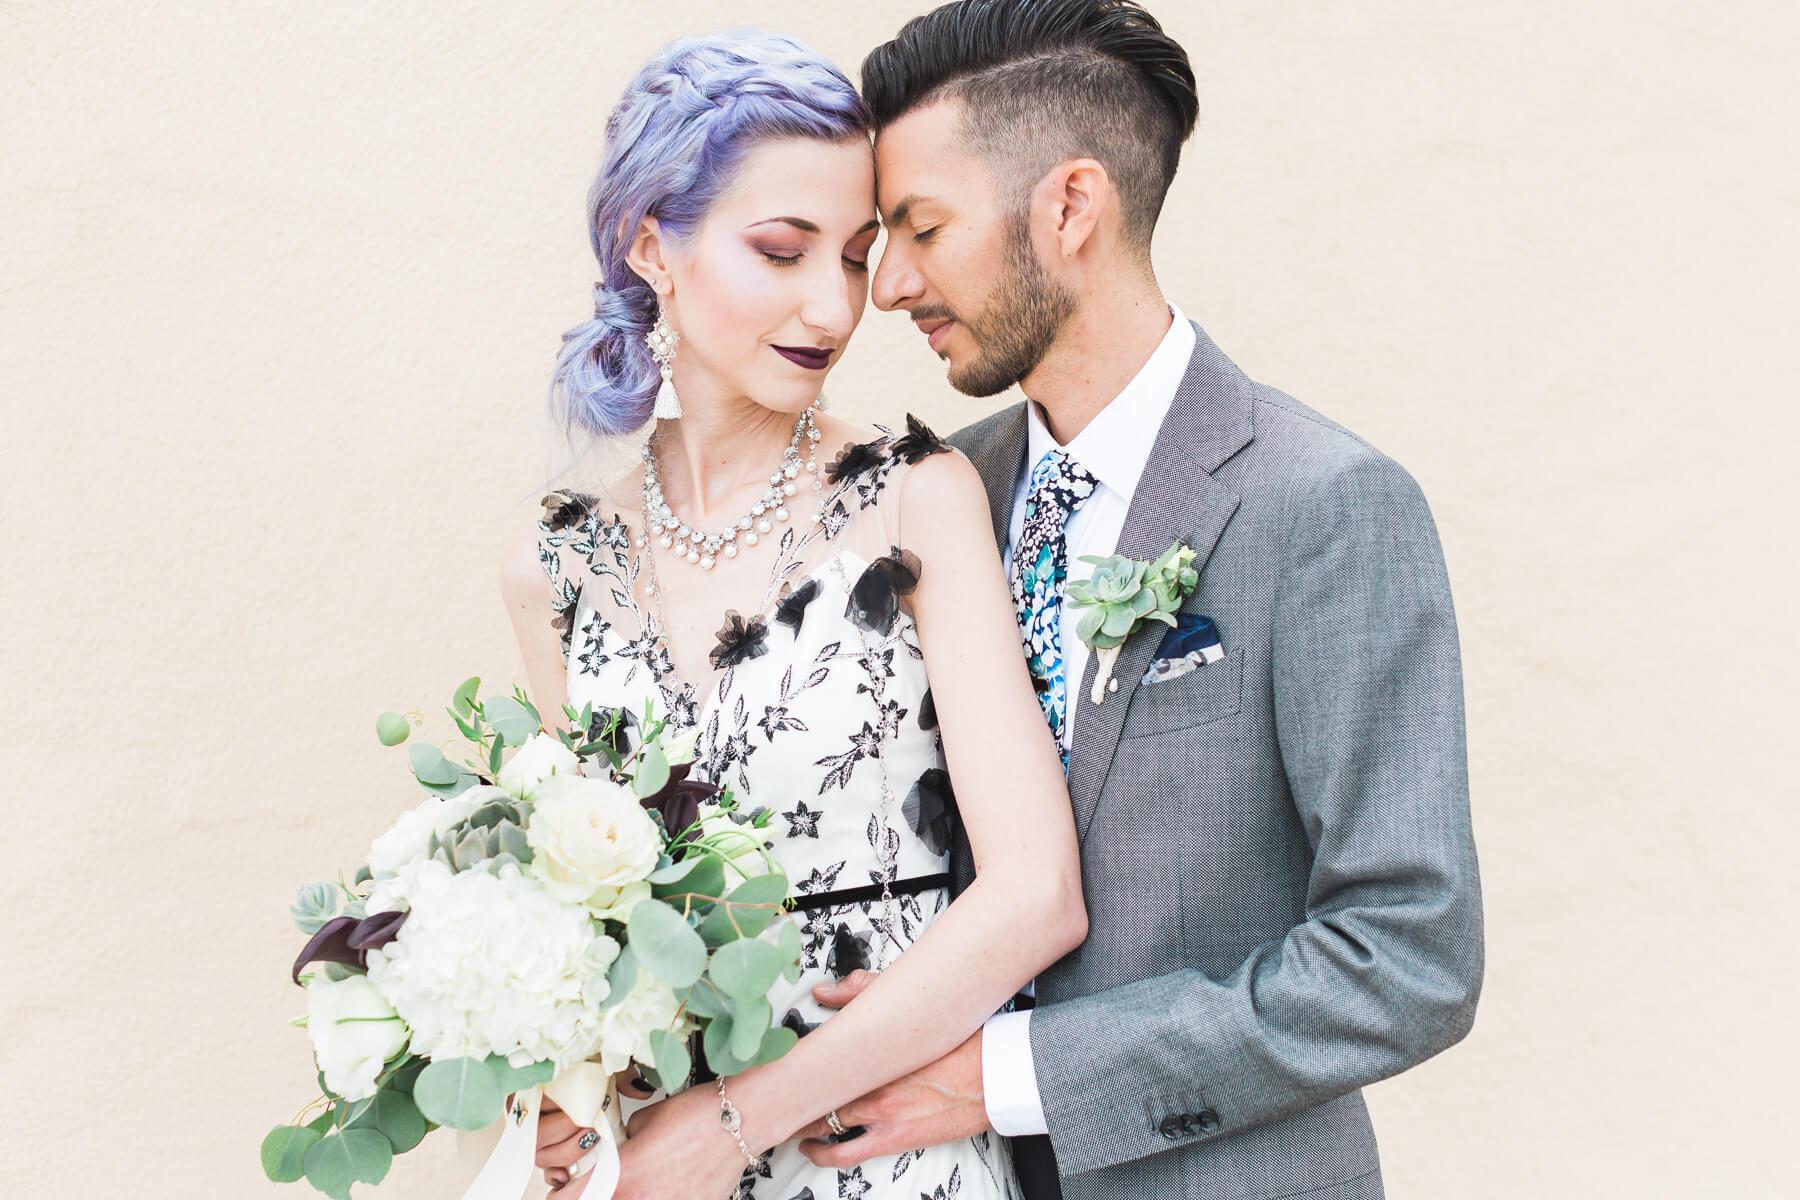 the_light_and_glass-wedding-photography-kim-jon-057.jpg